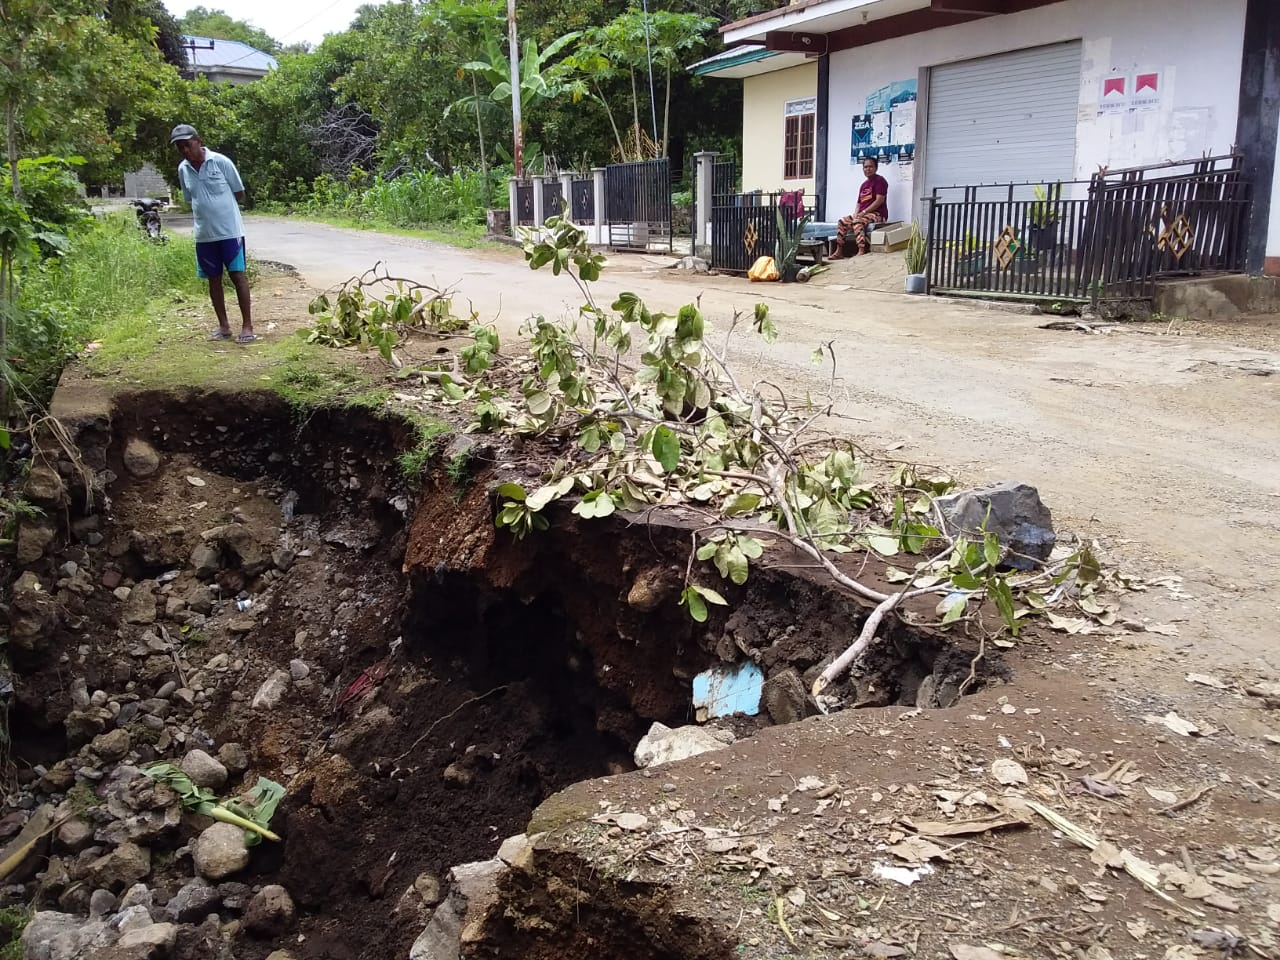 Curah Hujan Tinggi, Jalan Masuk Obyek Wisata Pantai Deri Rusak Berat